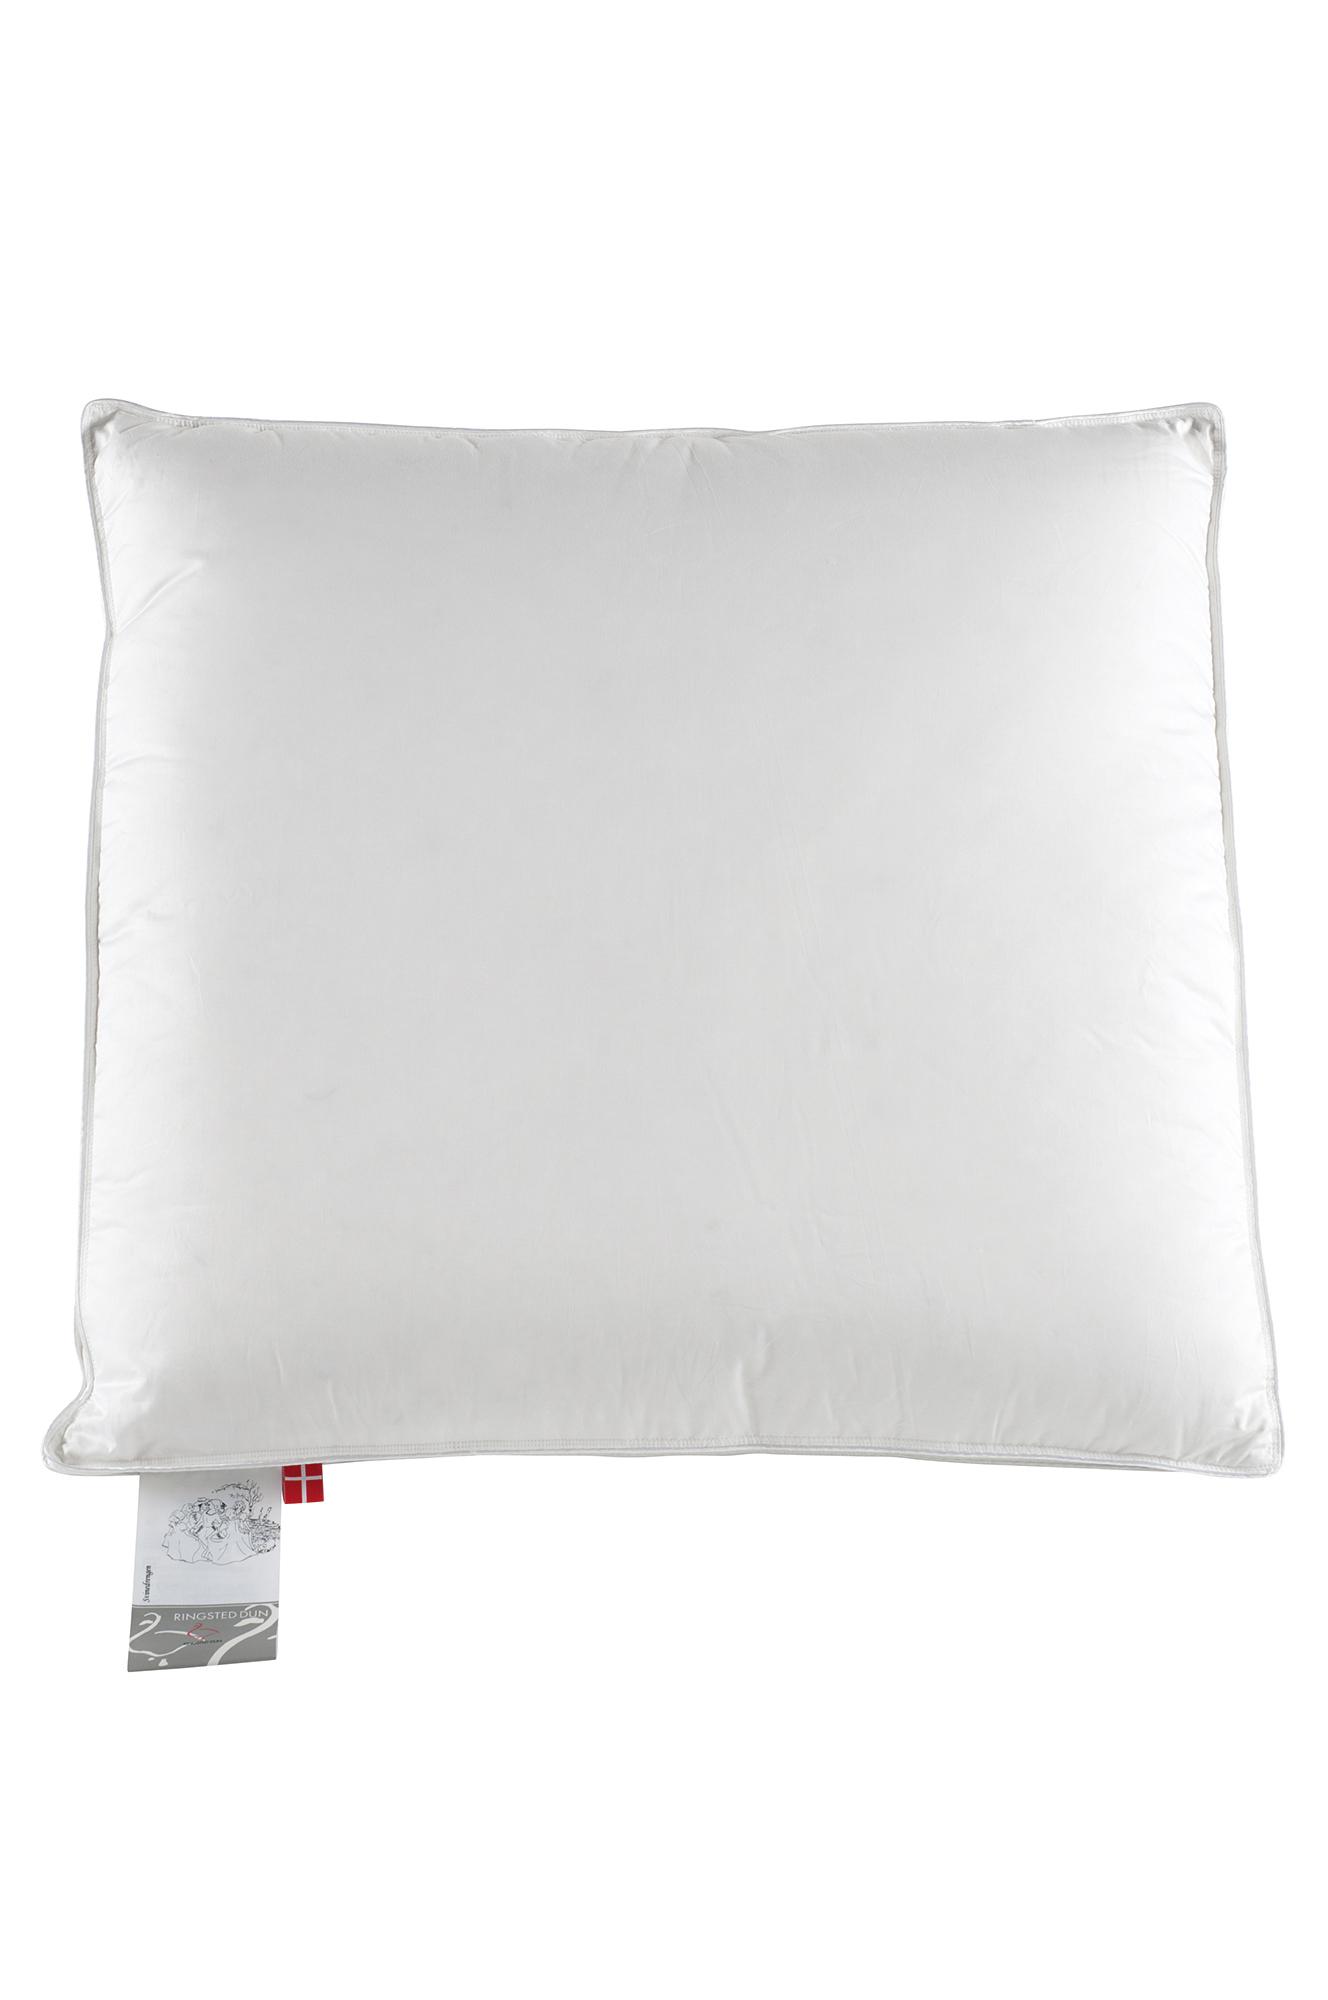 Ylellinen untuvatyyny, matala 50x60 cm